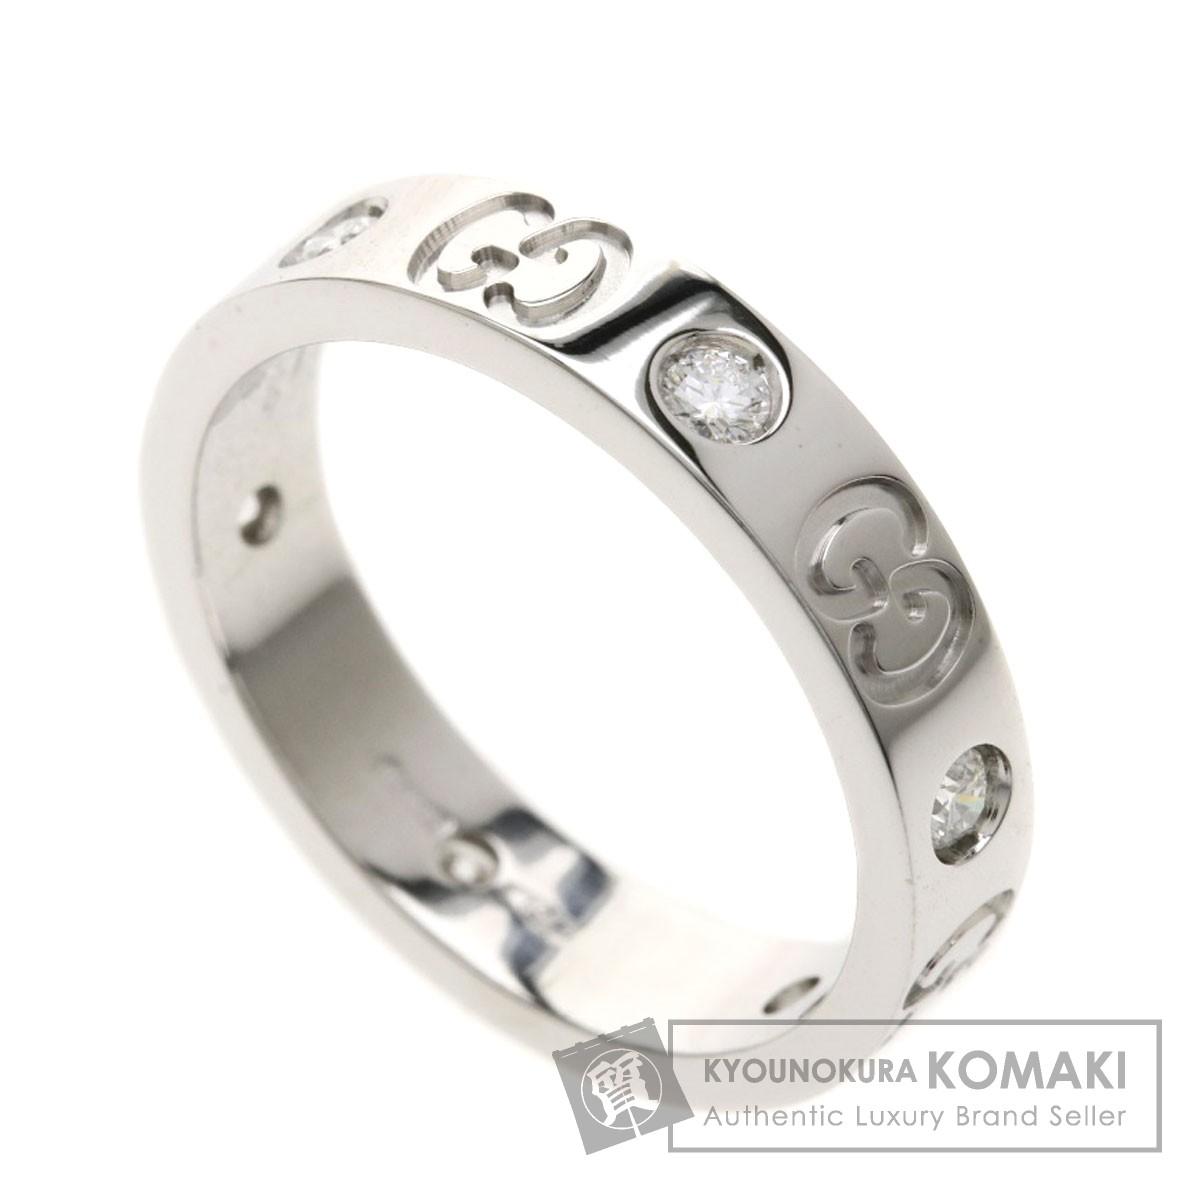 GUCCI アイコン 6Pダイヤモンド リング・指輪 K18ホワイトゴールド レディース 【中古】【グッチ】